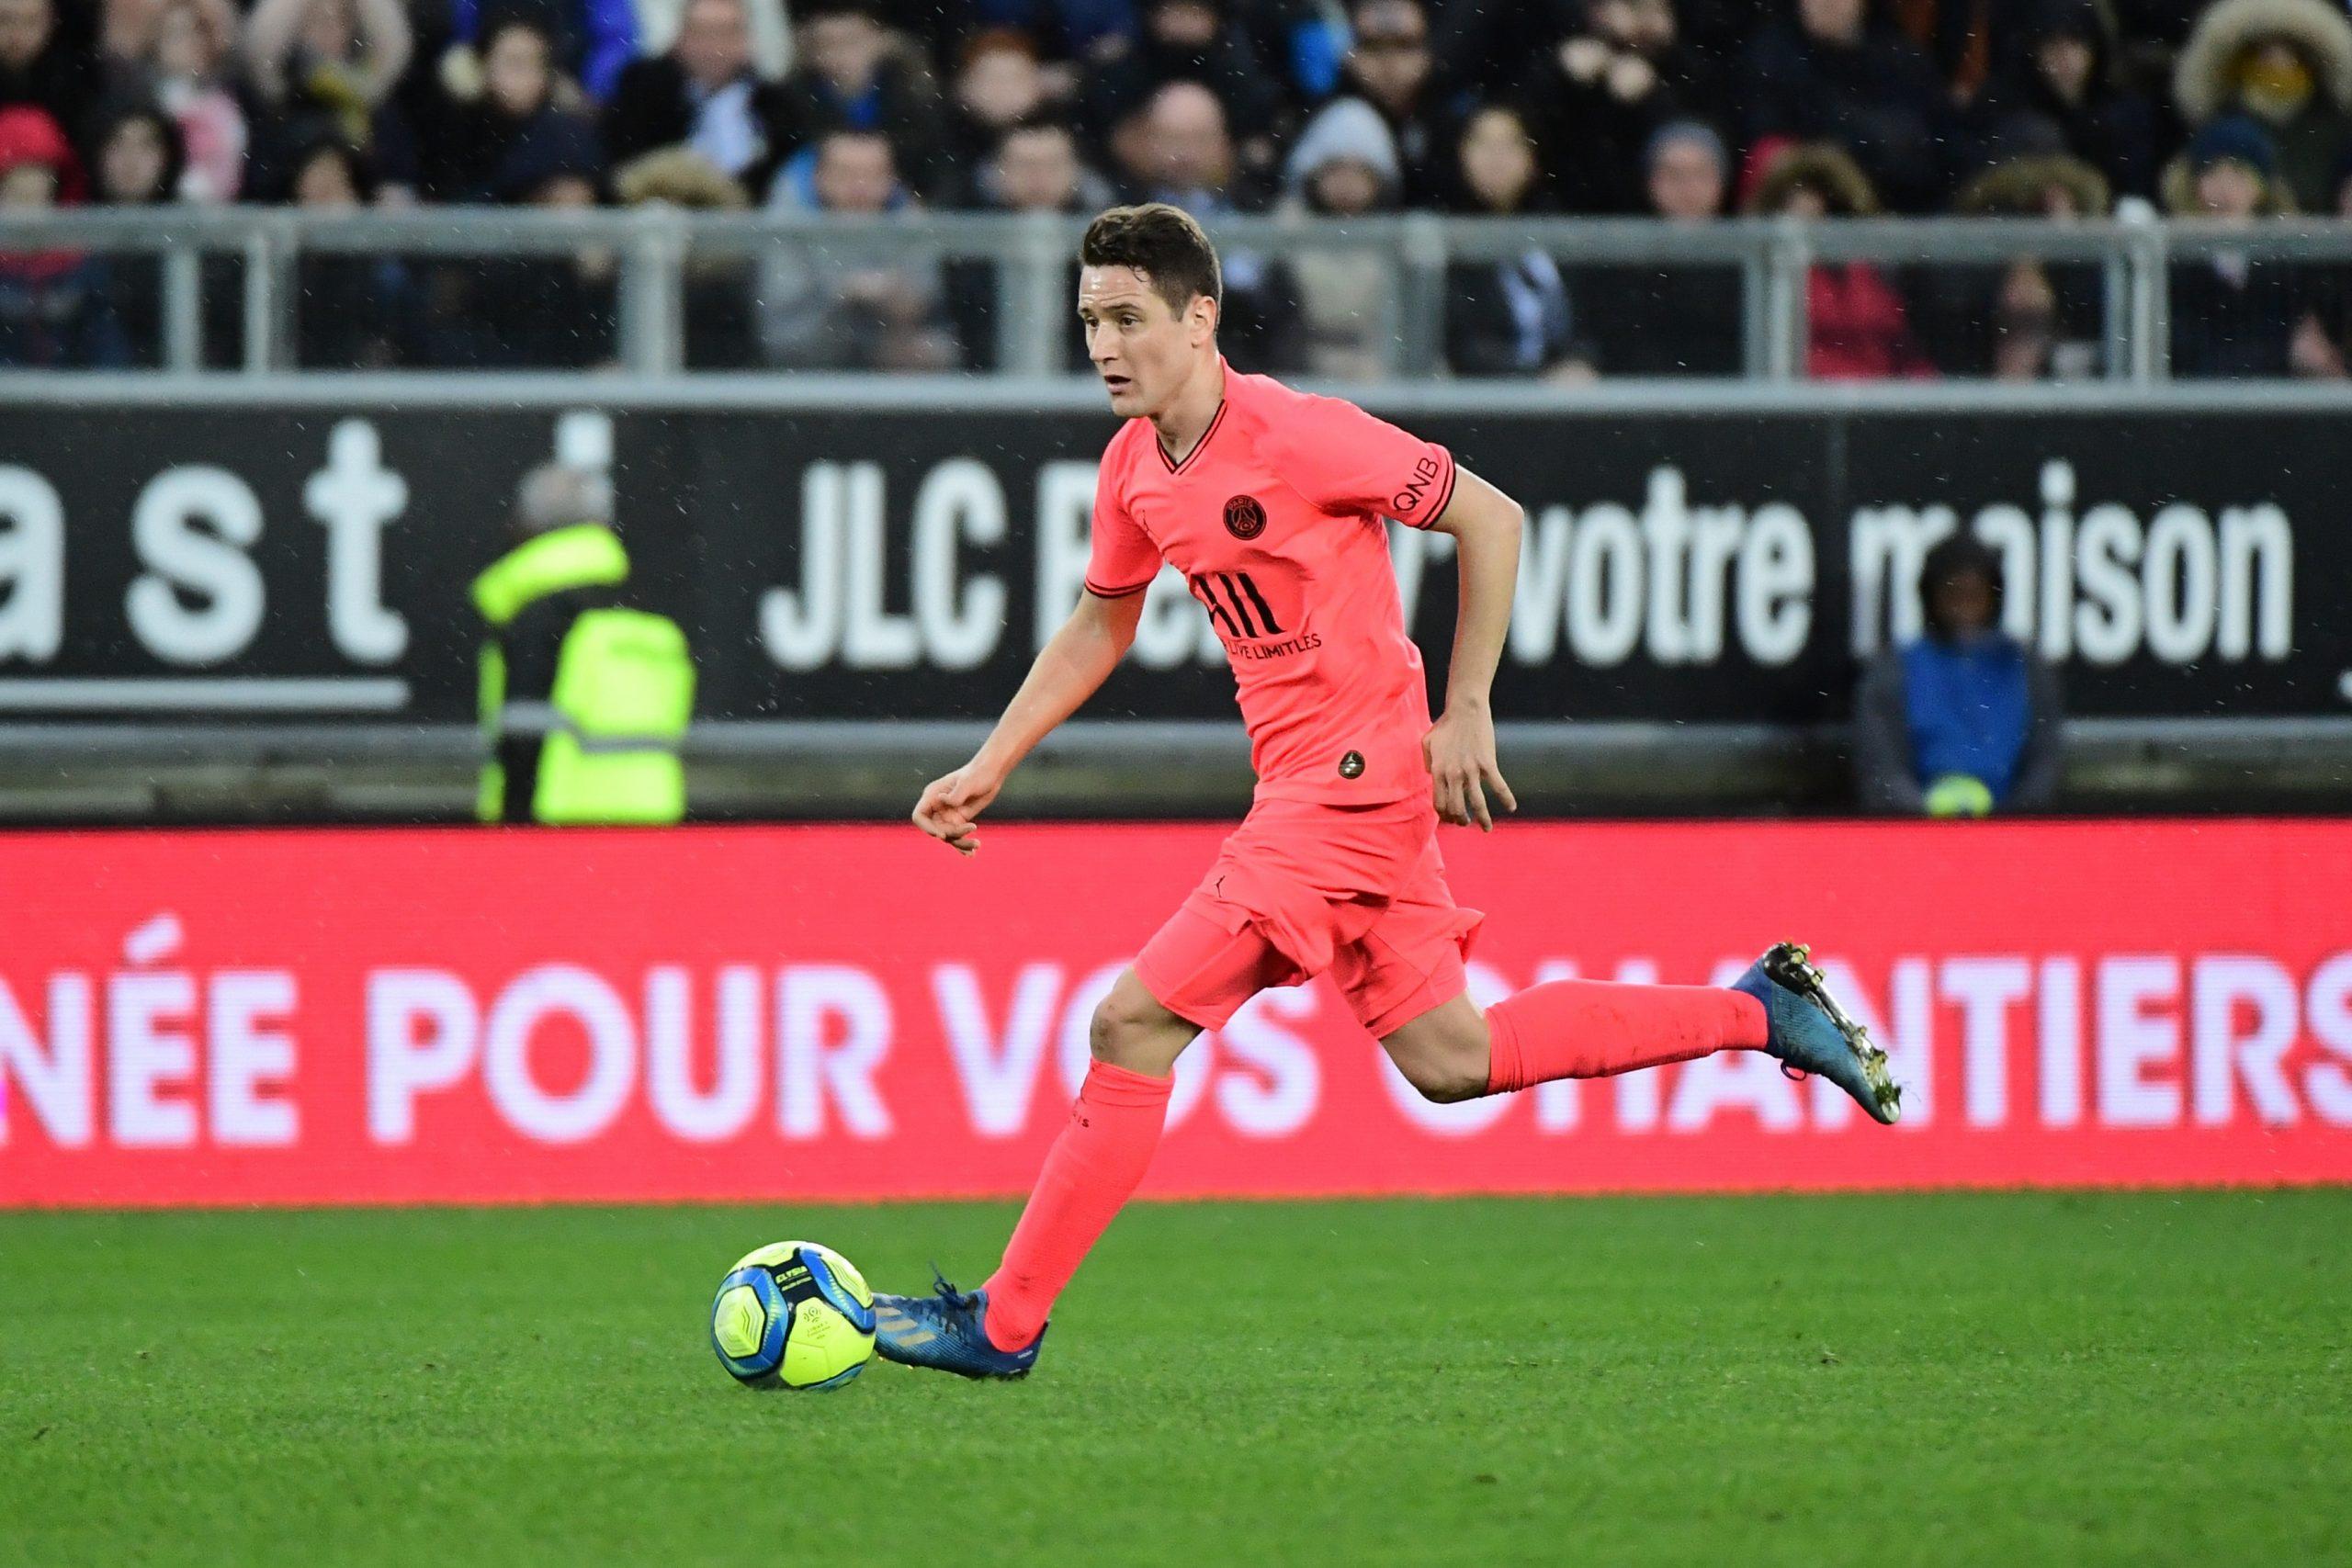 Herrera ne s'inquiète pas avant Dortmund et pense qu'Amiens va se maintenir en Ligue 1